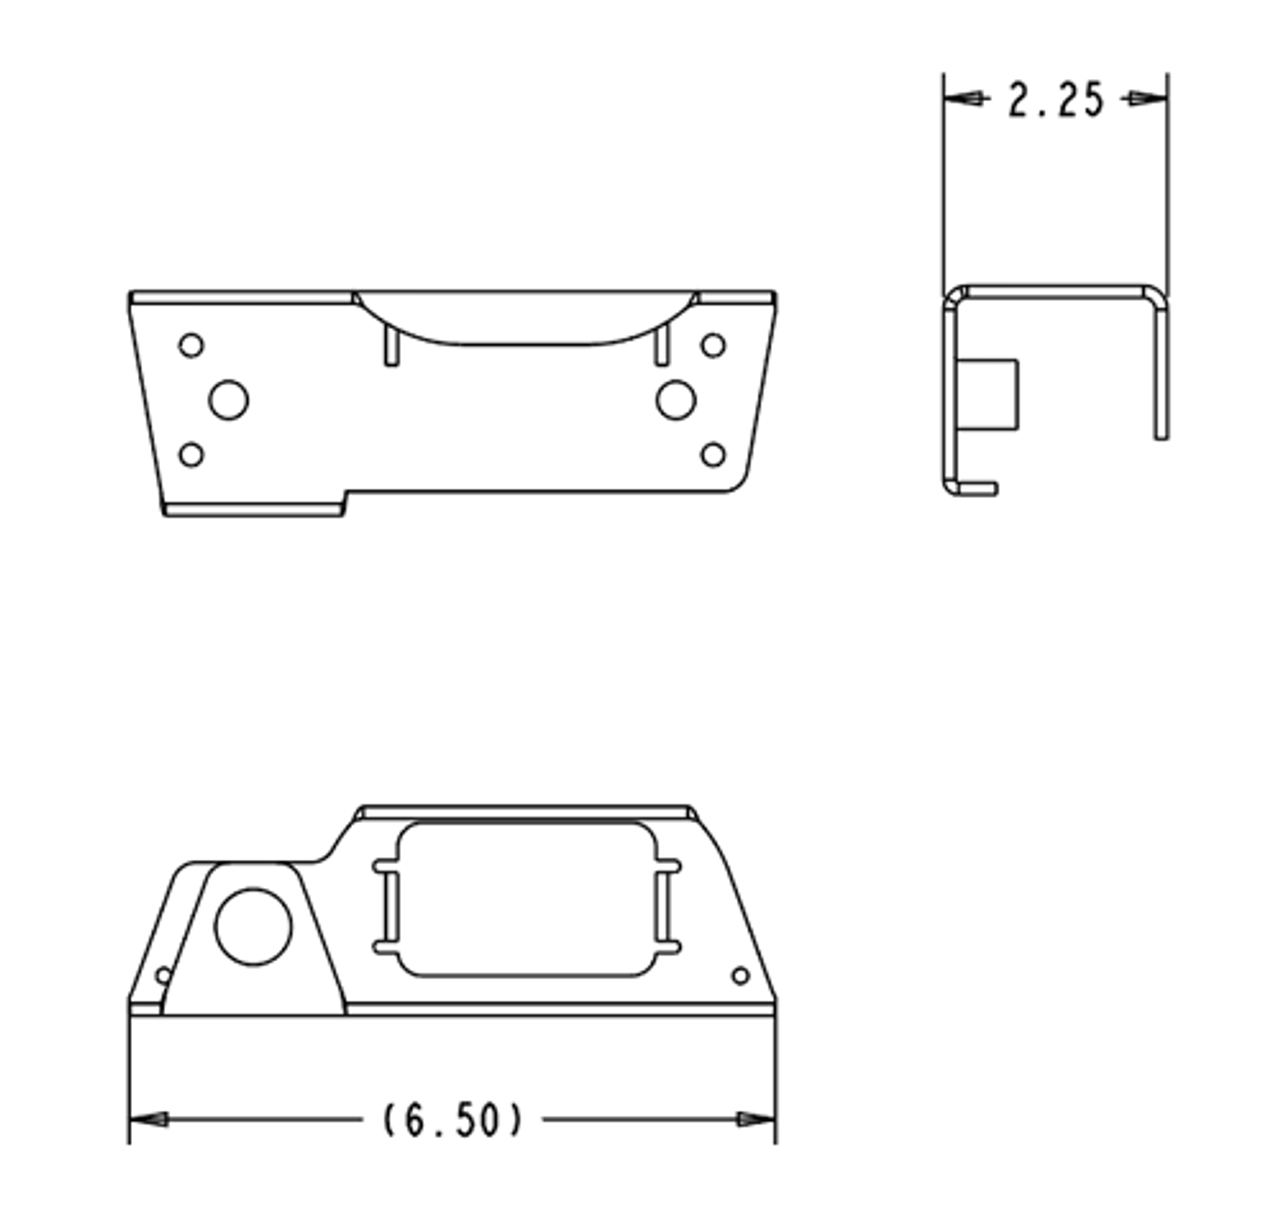 Air Coupler and SB175 Bracket KIT (ACB-5KIT)